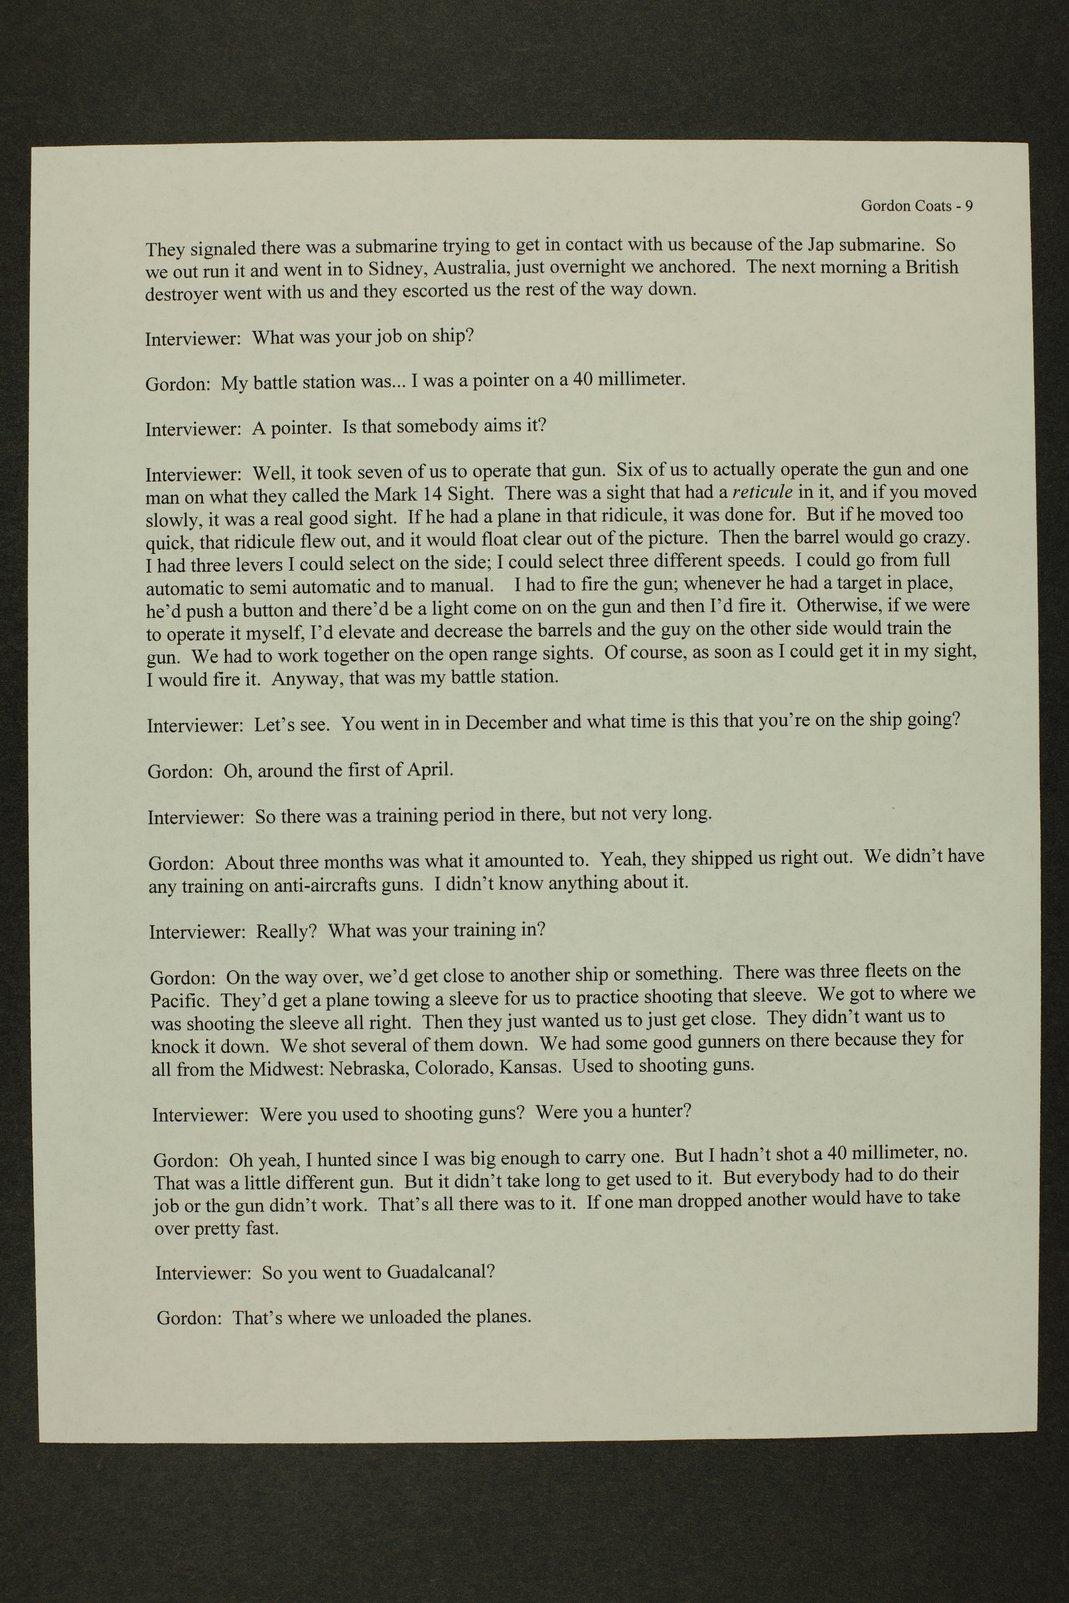 Gordon Lee Coats interview, WWII oral history, Kinsley, Kansas - 9